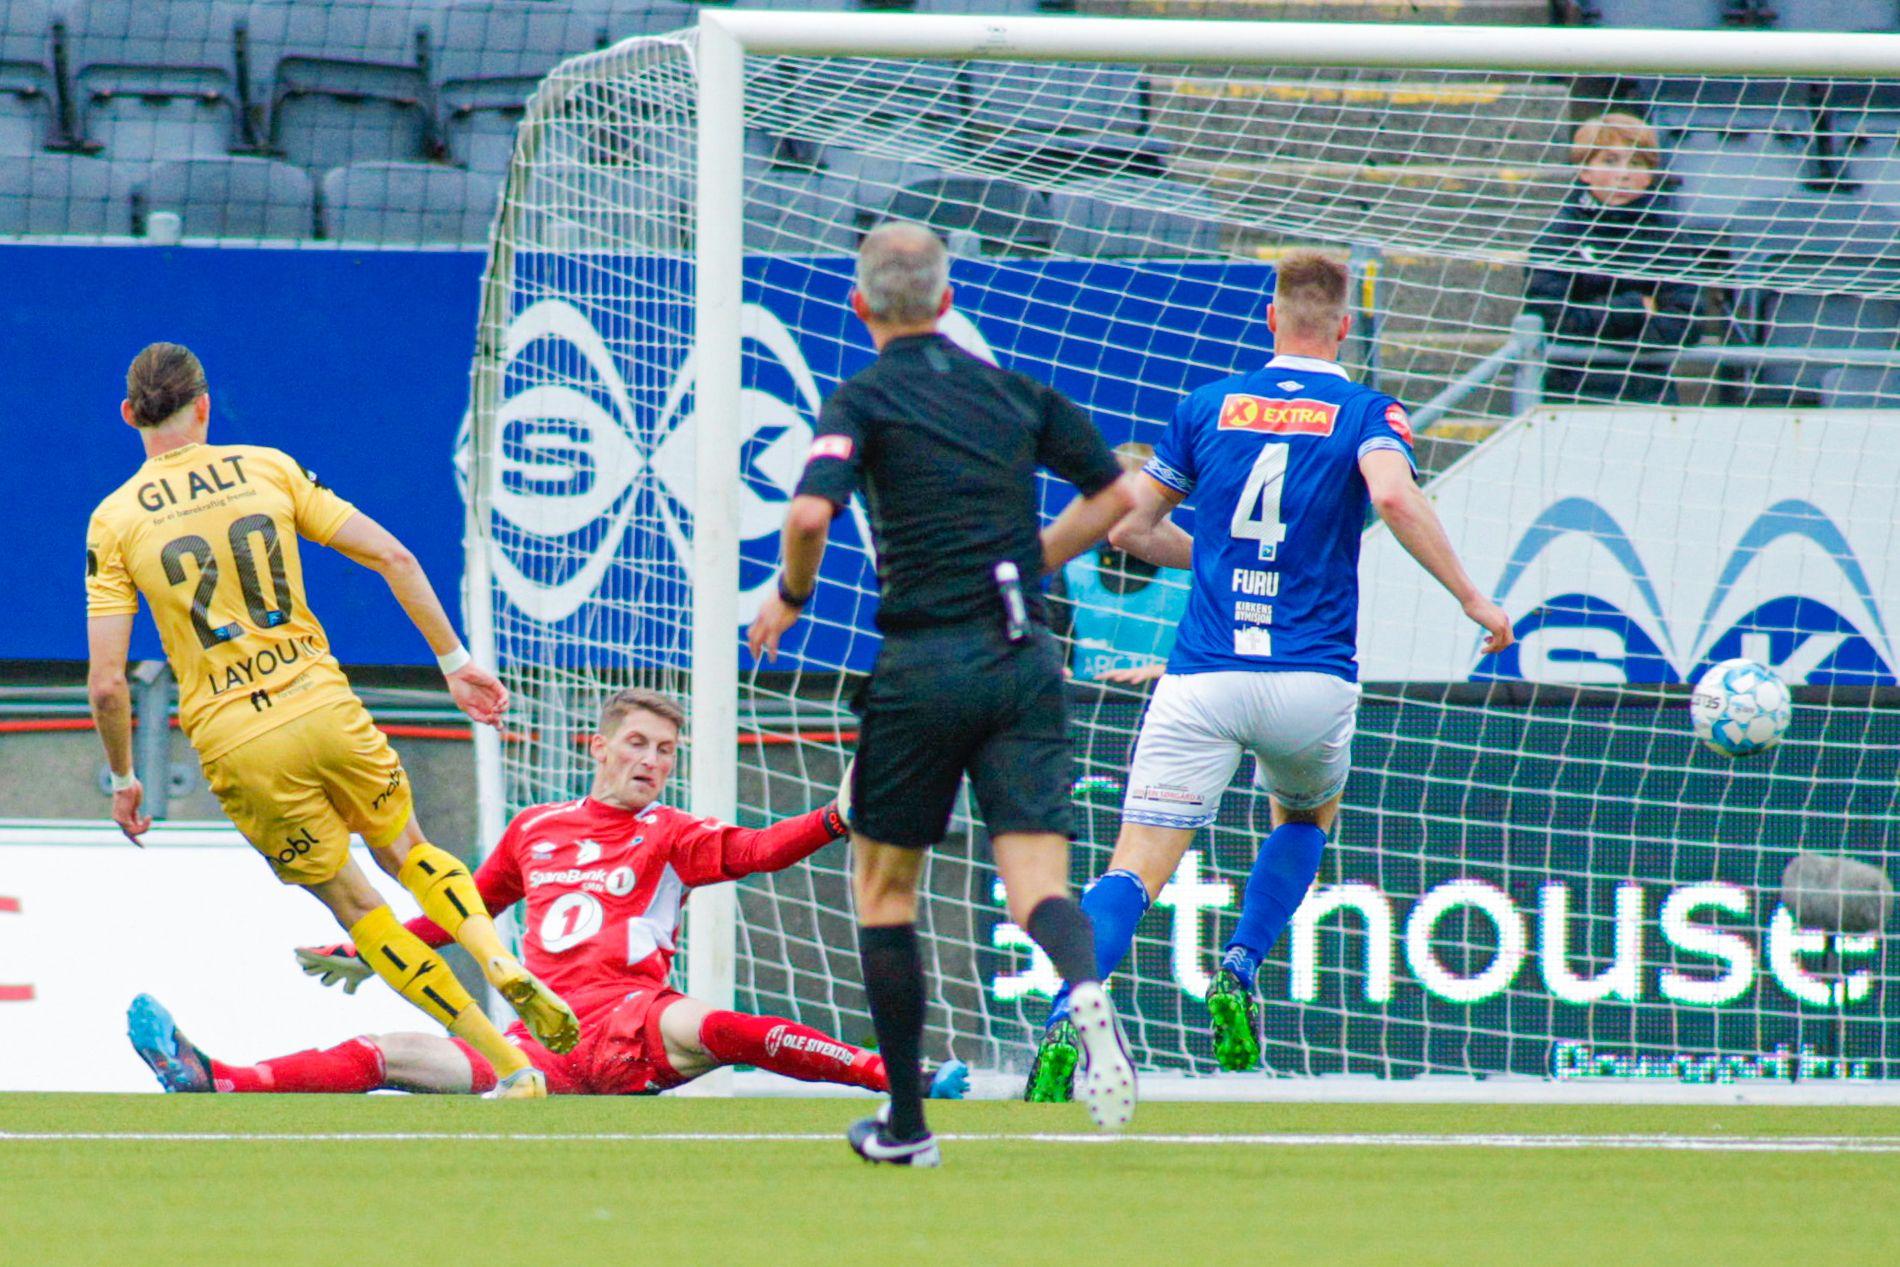 MÅL: Amor Layouni setter inn 1–0 bak Ranheim-keeper Even Barli.